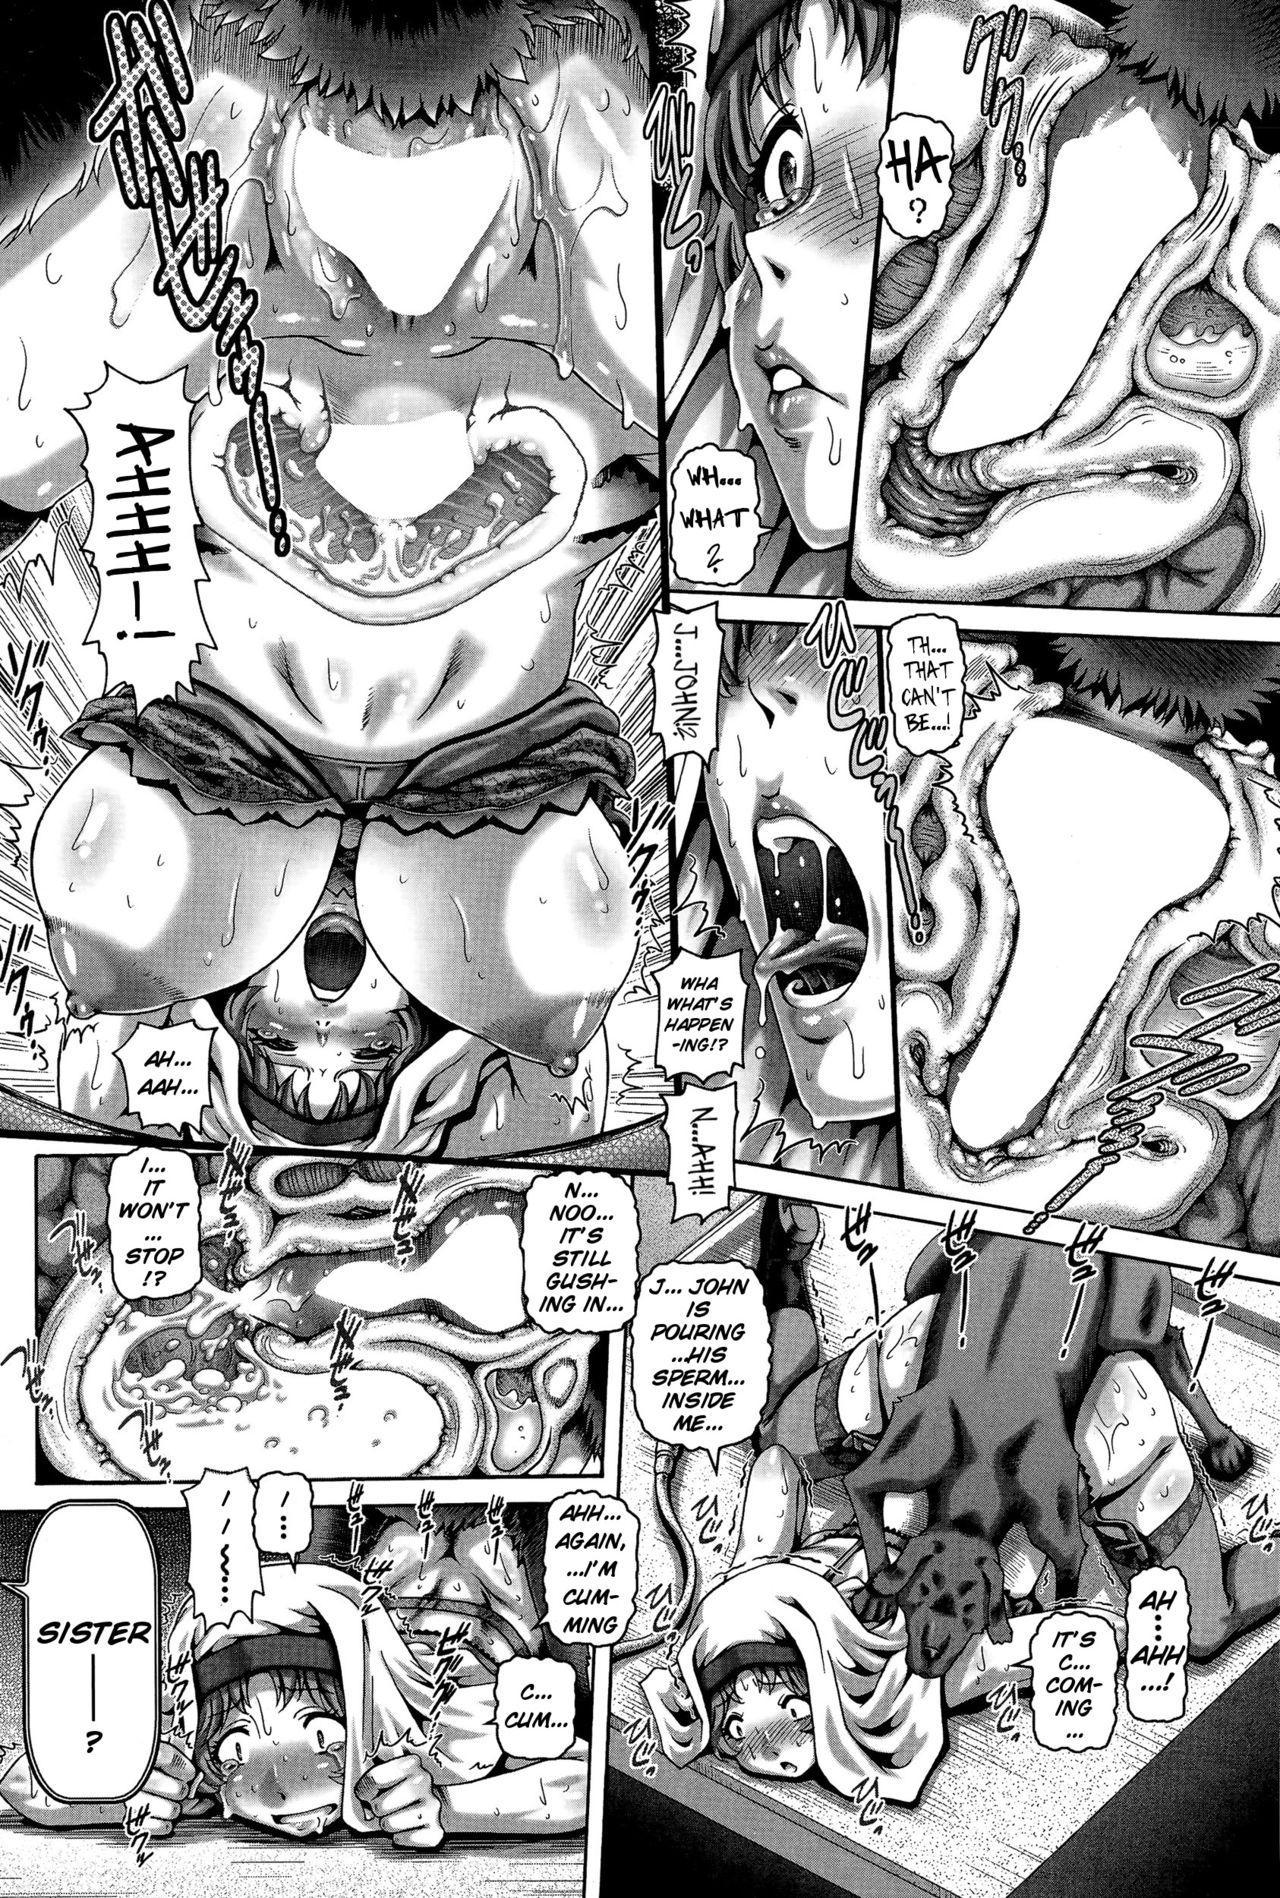 Shito no Mesu - The Apostle's Bitch 18